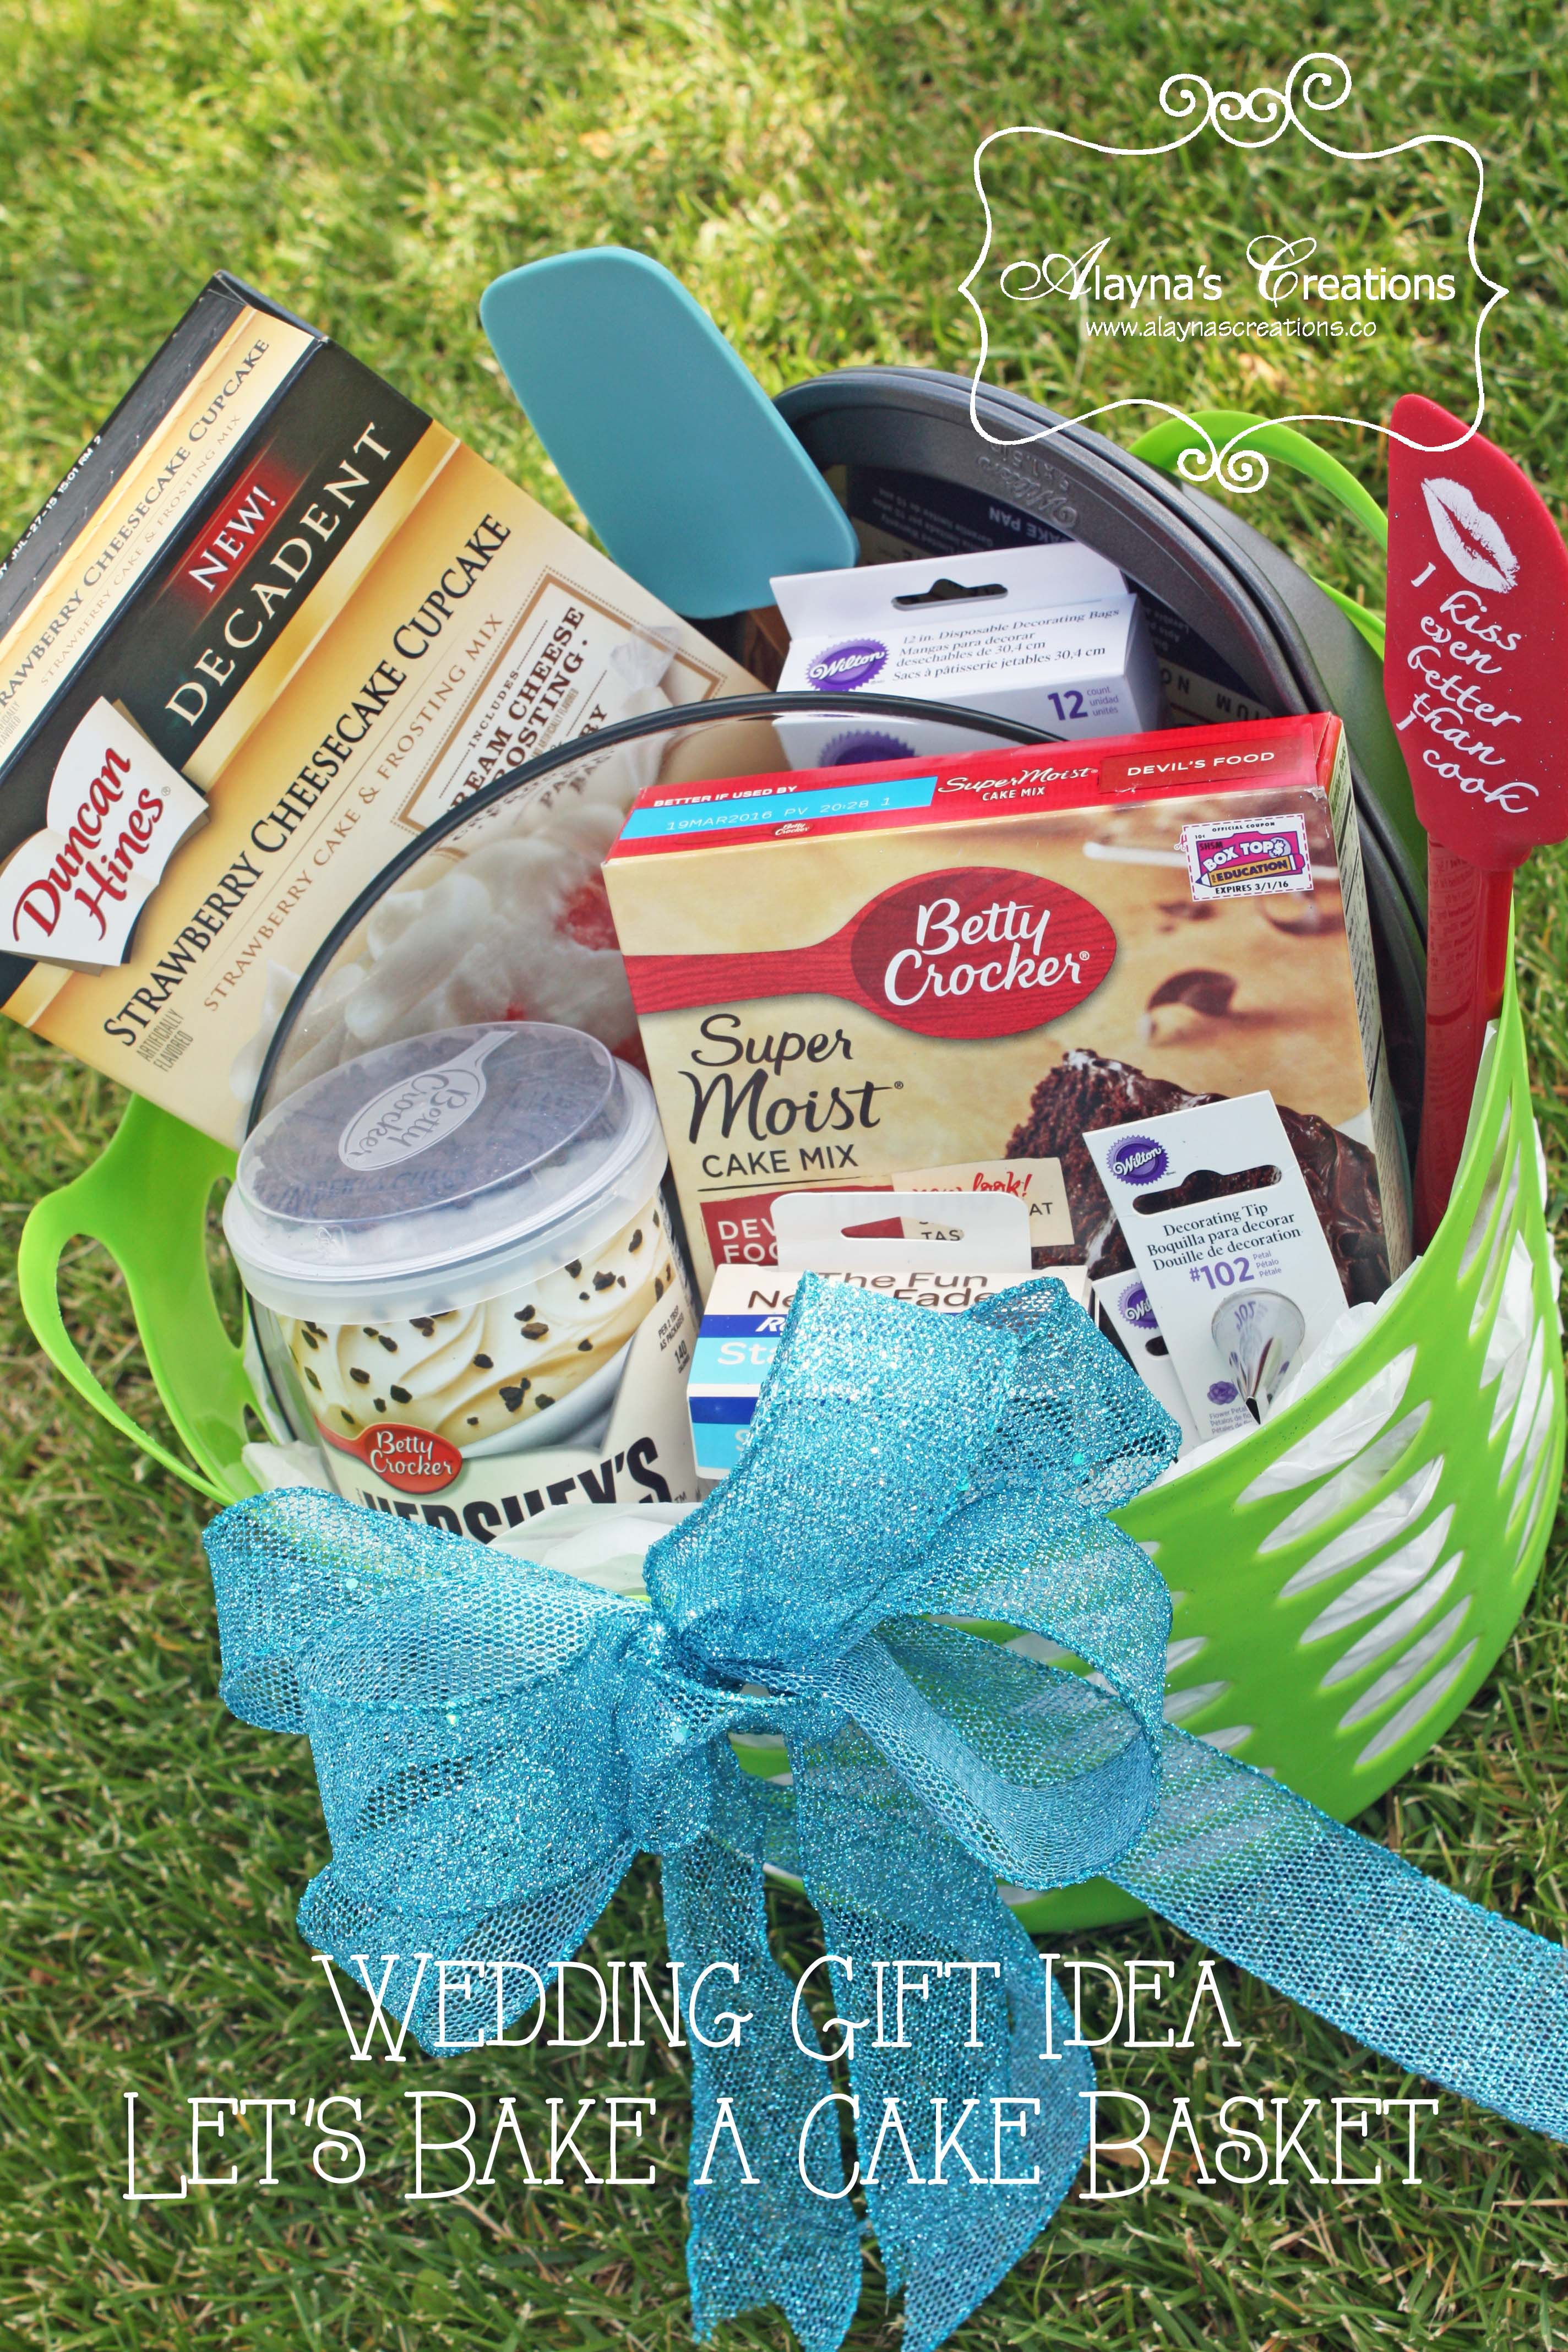 Let\'s Bake a Cake - Wedding Gift Basket - DIY home decor and crafts